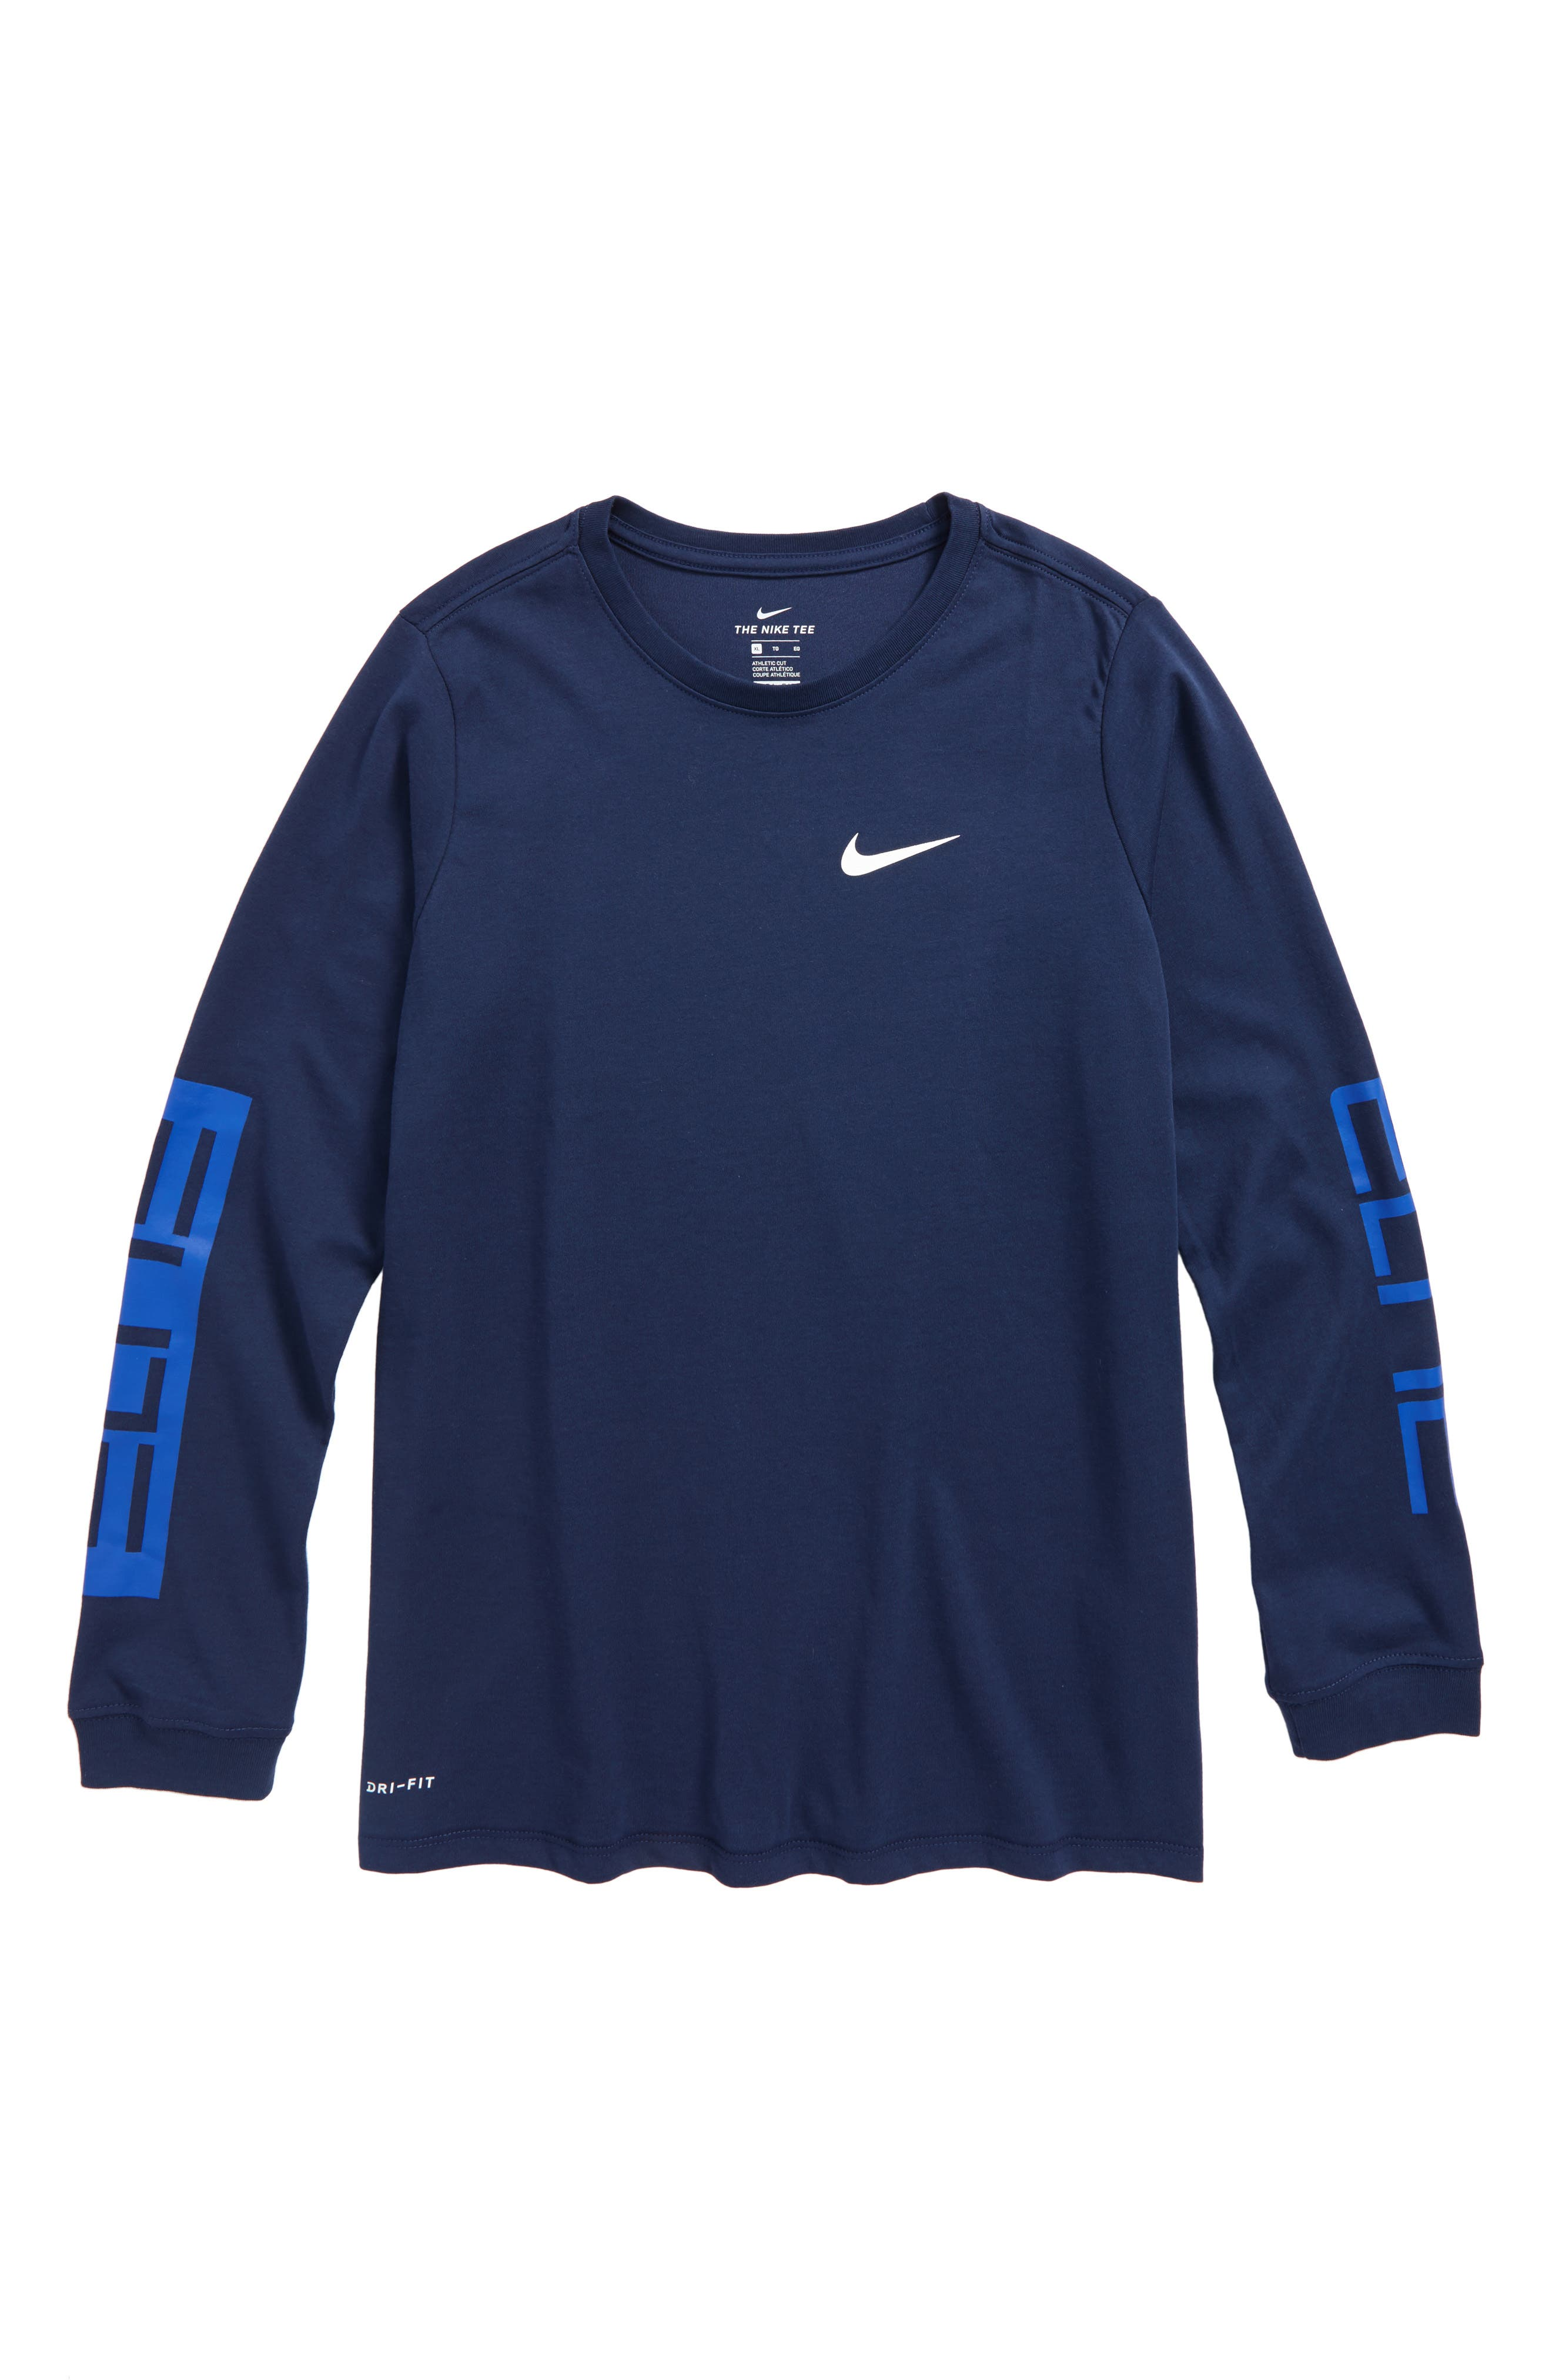 Dry Elite Long Sleeve T-Shirt,                         Main,                         color, Midnight Navy